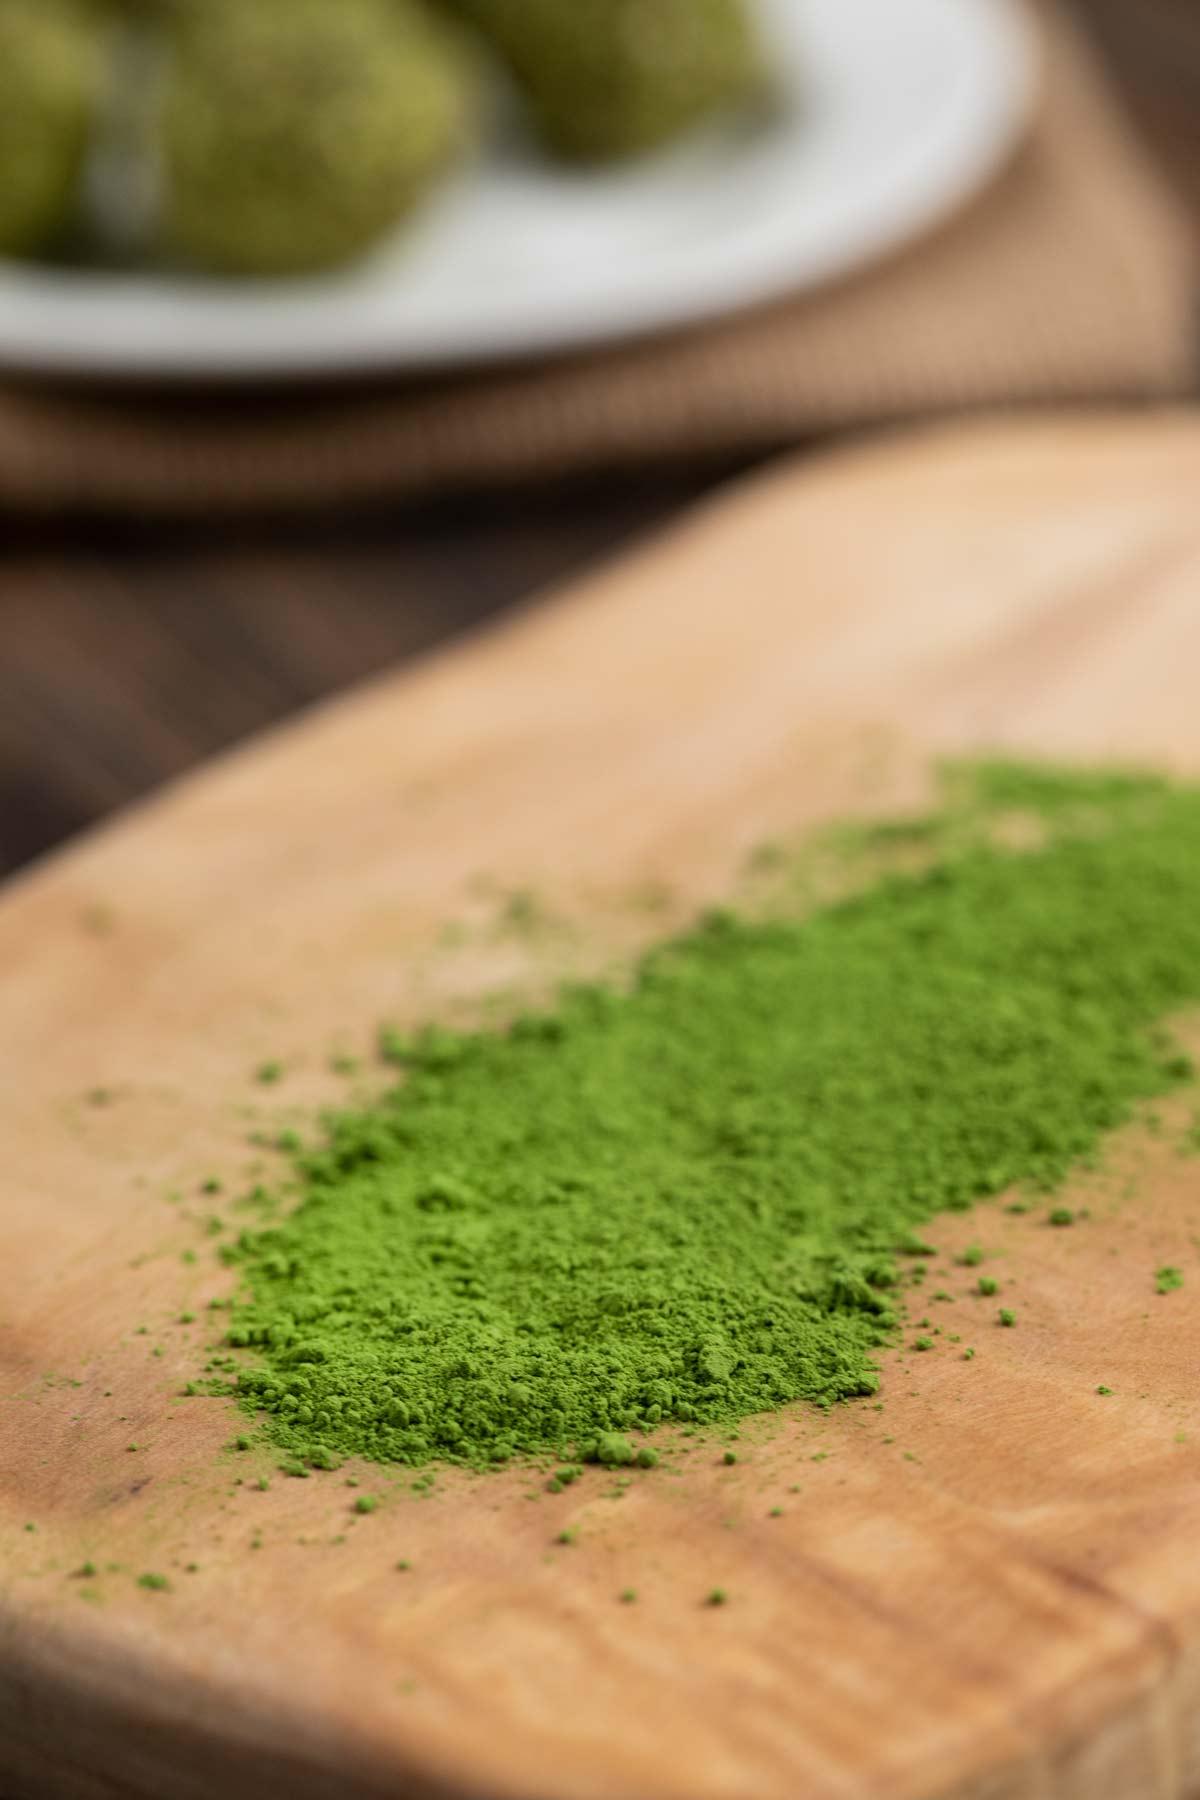 A cutting board with matcha green powder.